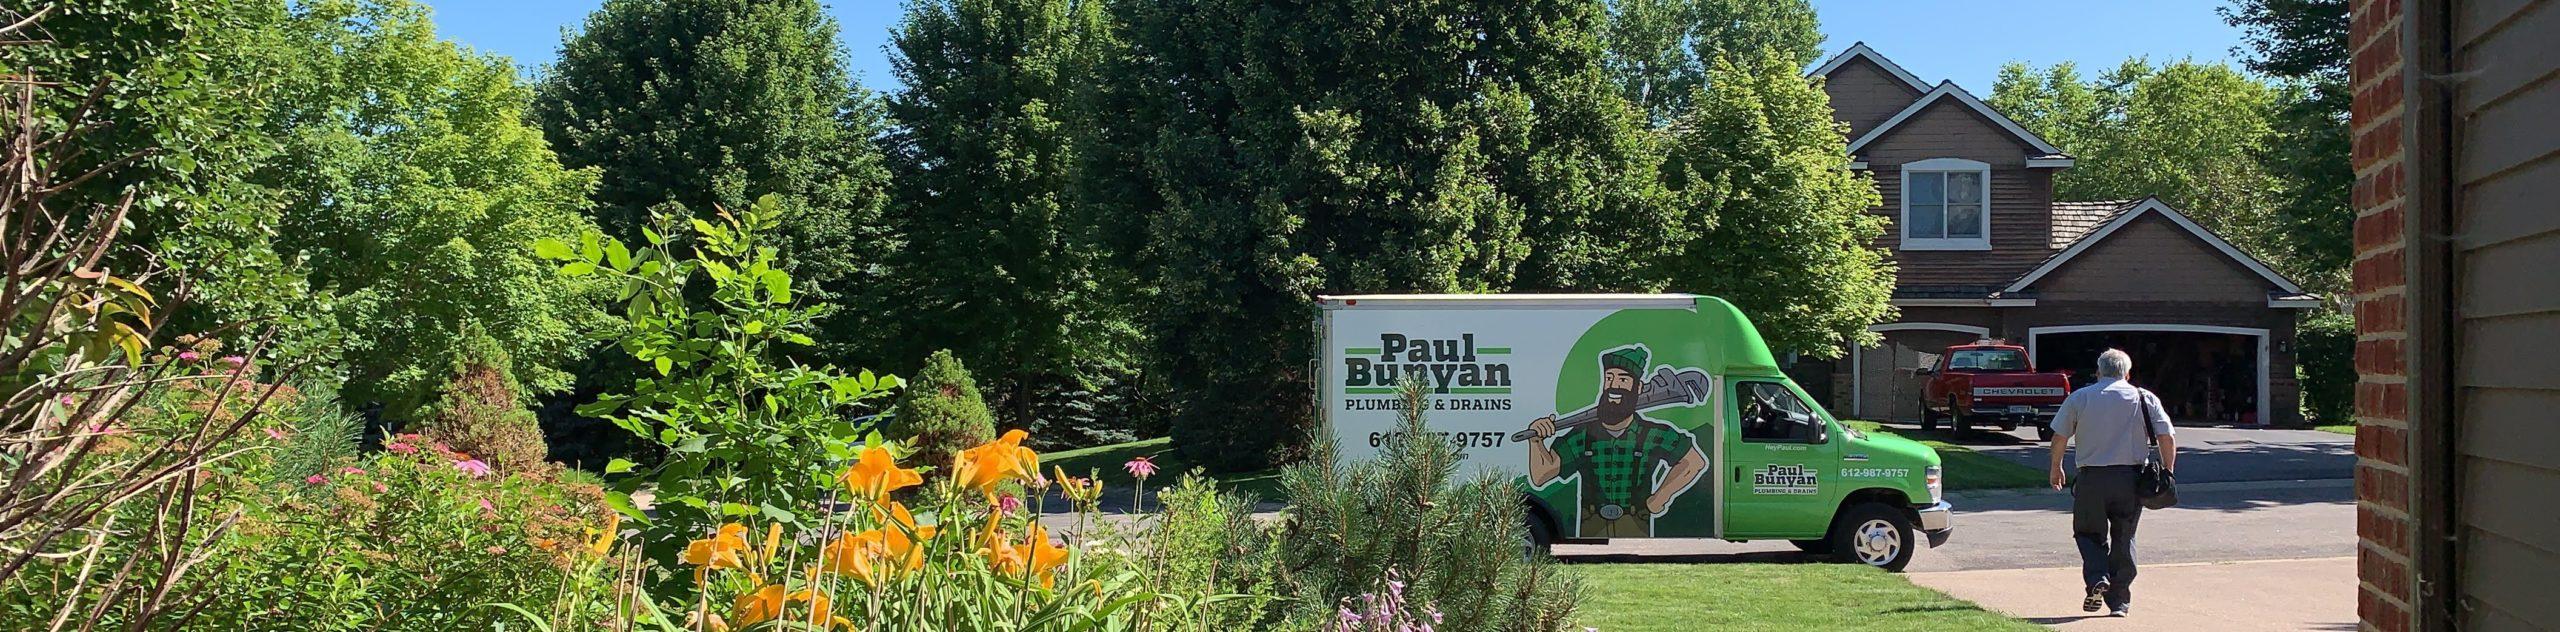 Paul Bunyan Plumbing & Drains- Serving Stillwater, MN